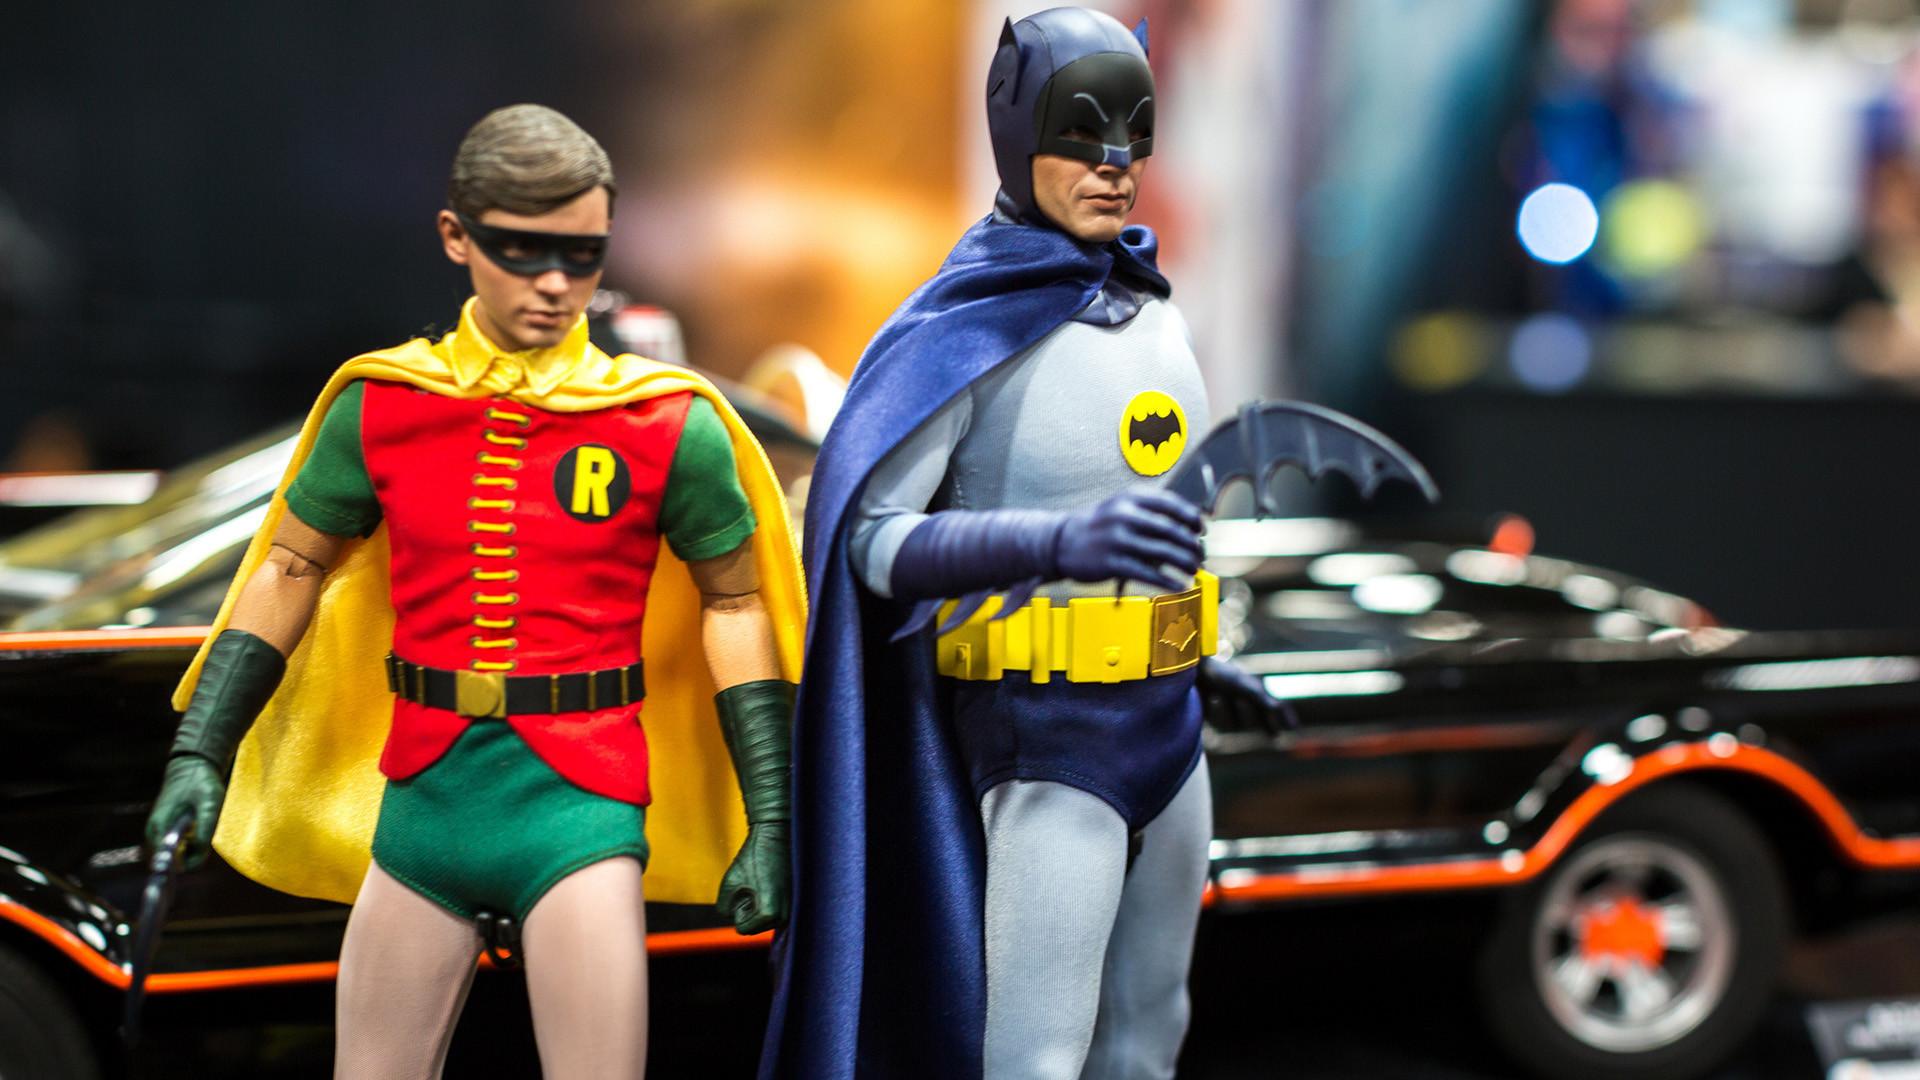 Hot Toys Batman 1966 Sixth Scale Figure